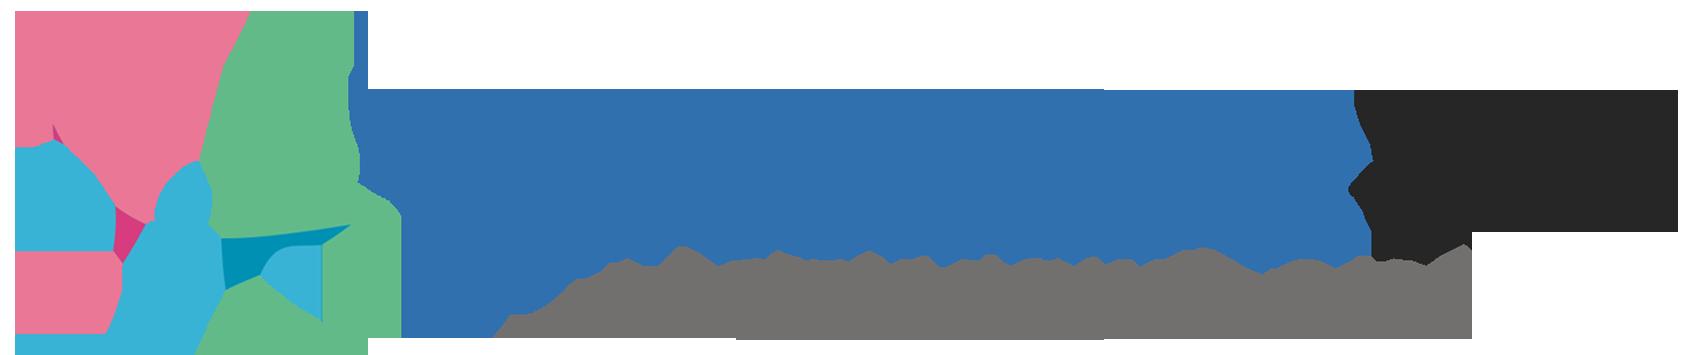 Cloud-based Home Care Software - CareSmartz360